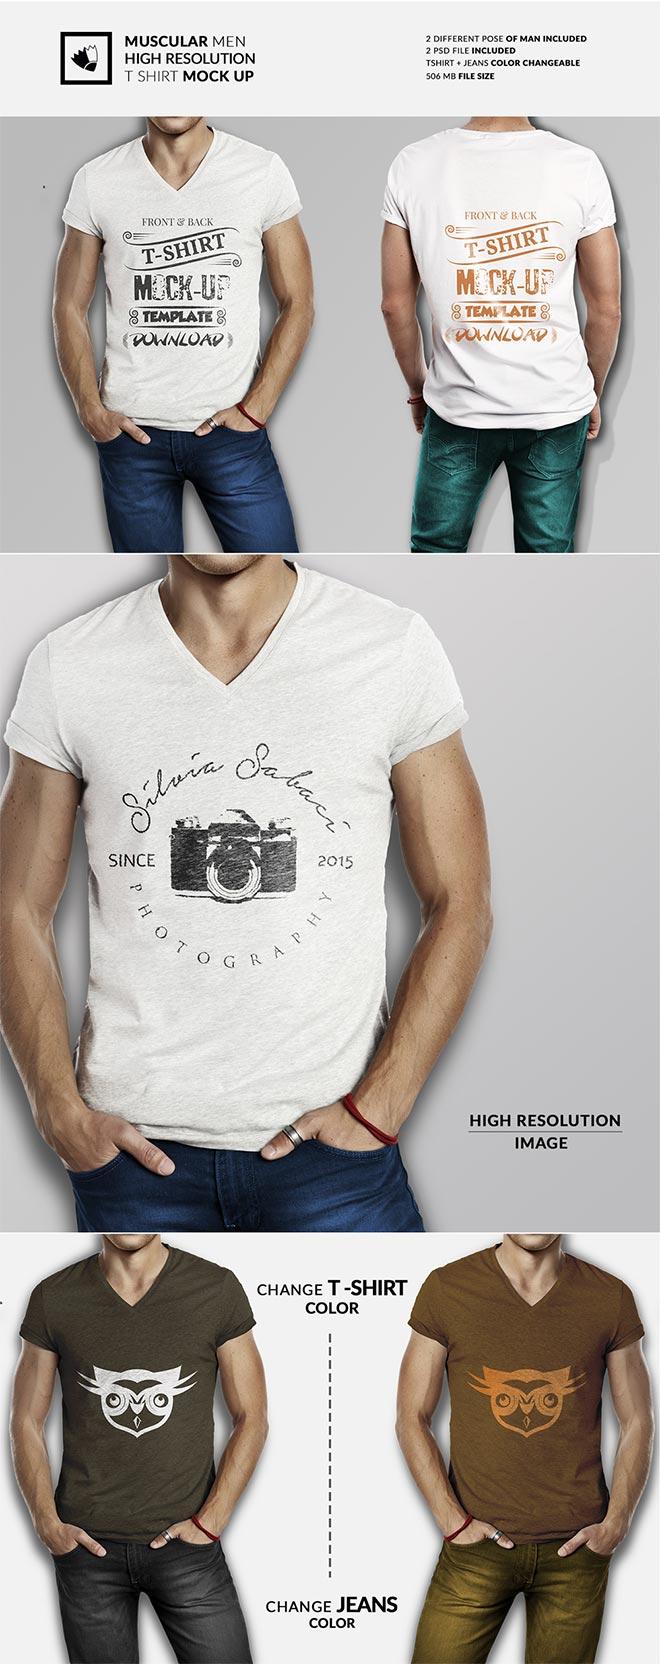 Muscular men high resolution t shirt mockup